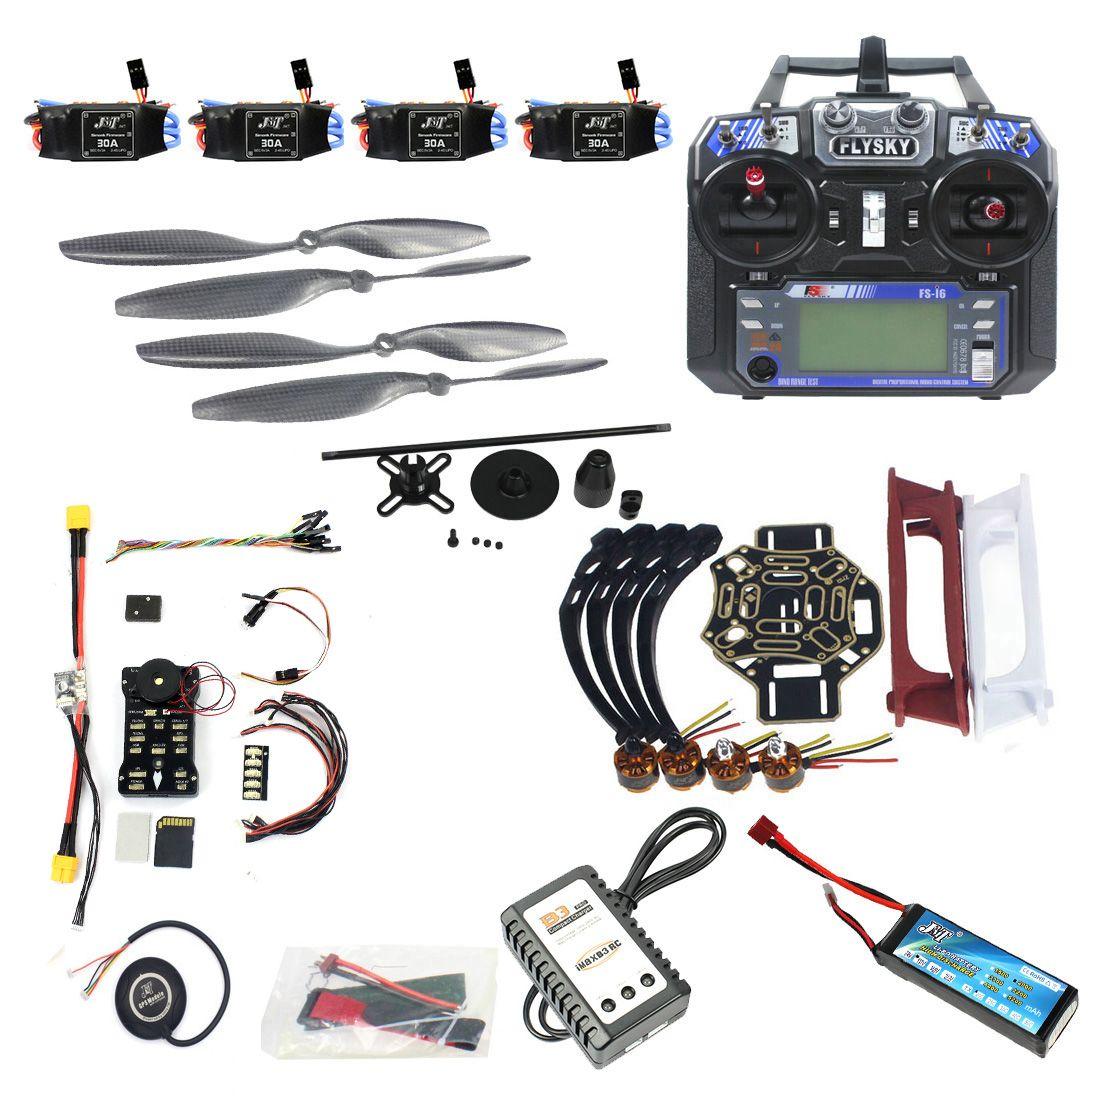 DIY FPV Drone Quadcopter 4-axle Aircraft Kit 450 Frame PXI PX4 Flight Control 920KV Motor GPS FS-i6 Transmitter